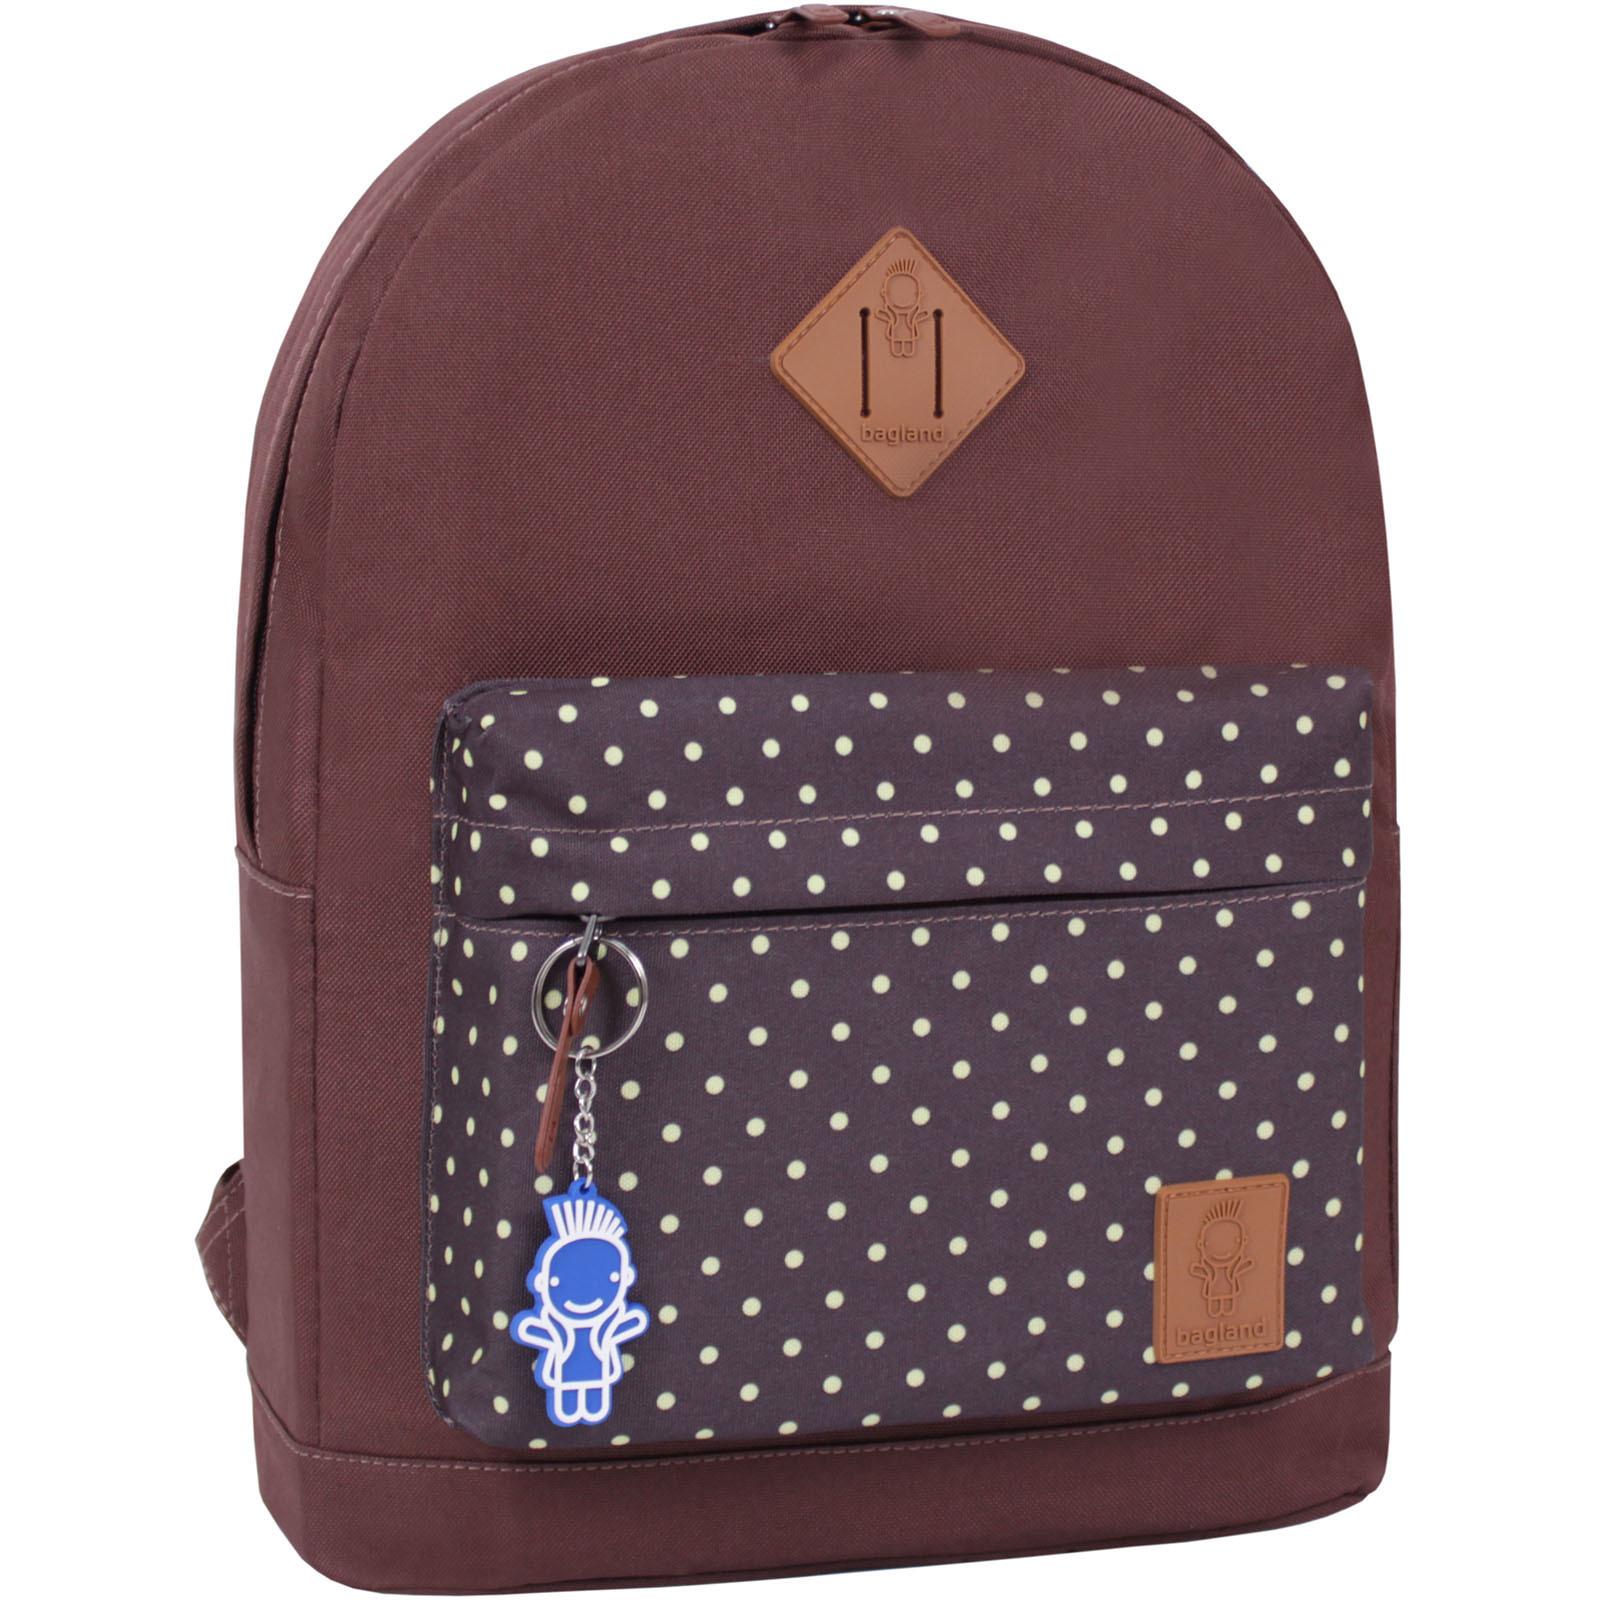 Средние рюкзаки Рюкзак Bagland Молодежный W/R 17 л. коричневый сублимация 26 (00533662) IMG_8295_суб.26_.JPG